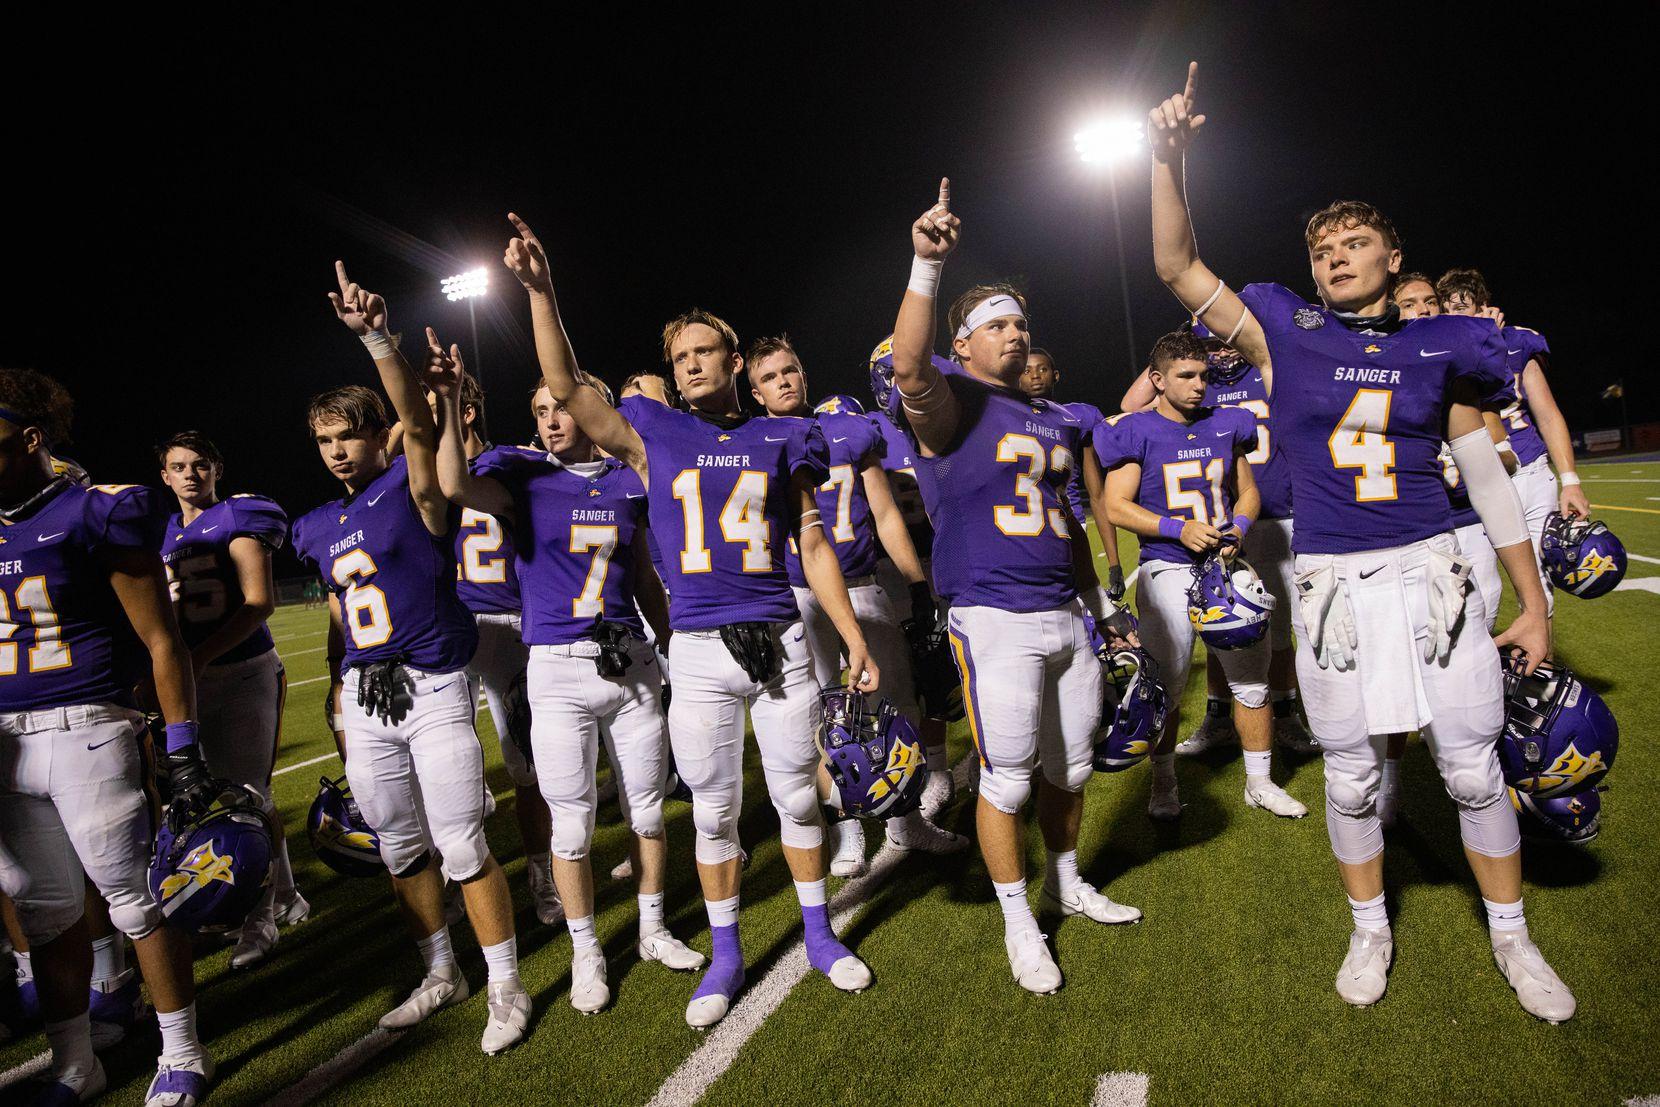 Sanger High School players celebrate after winning against Lake Worth High School on Sept. 4, 2020 in Sanger. Sanger won 49-35. (Juan Figueroa/ The Dallas Morning News)